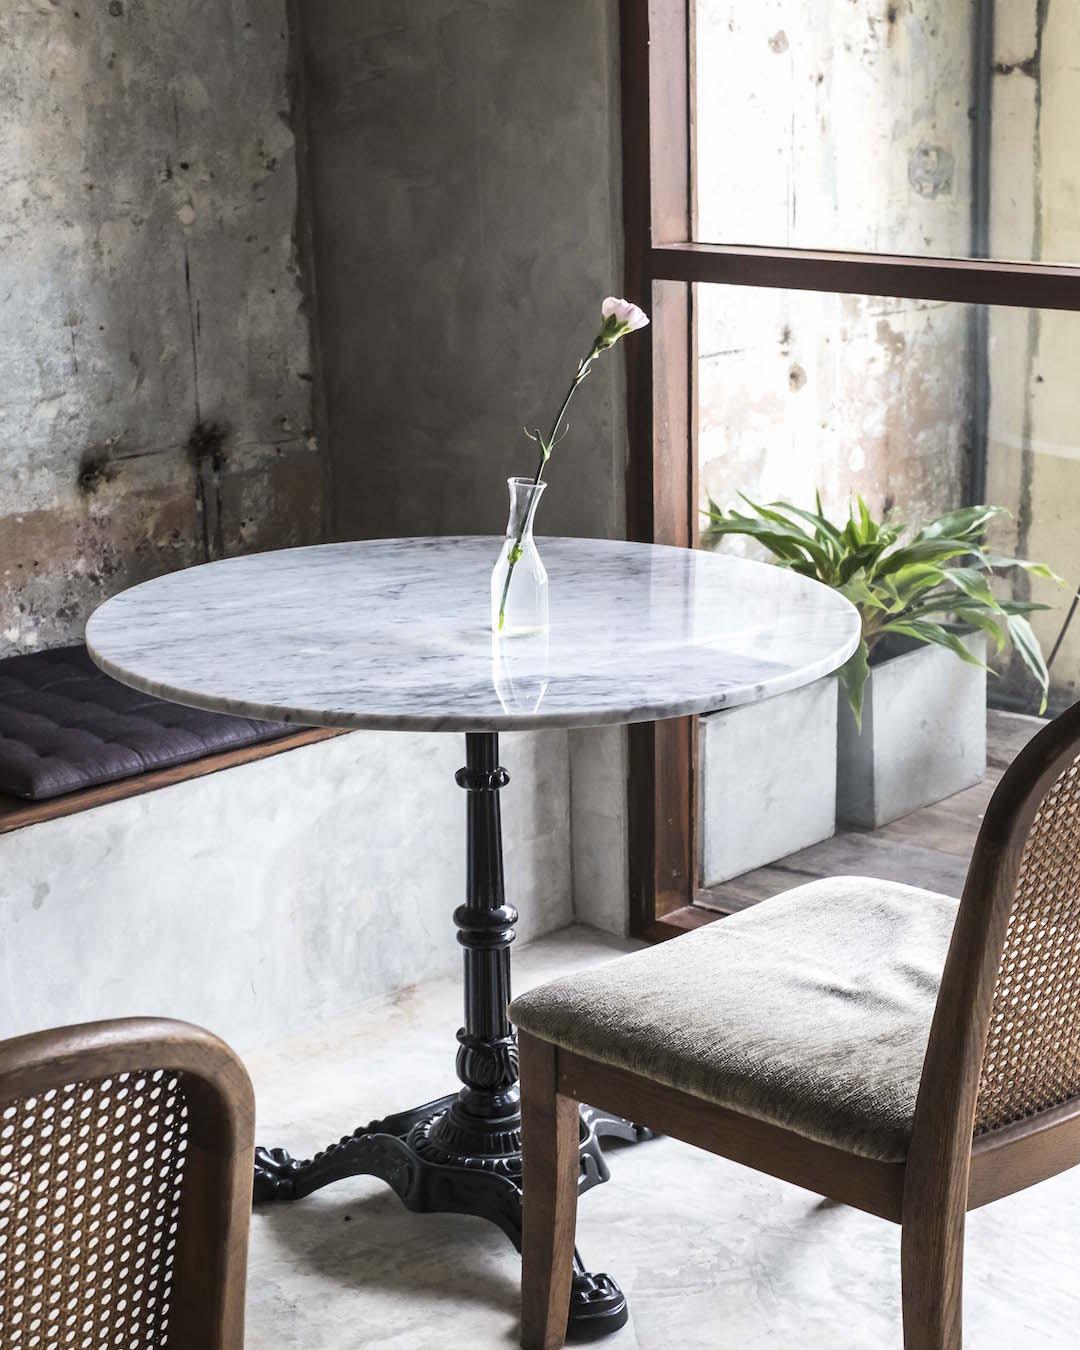 Cafe Veggie table